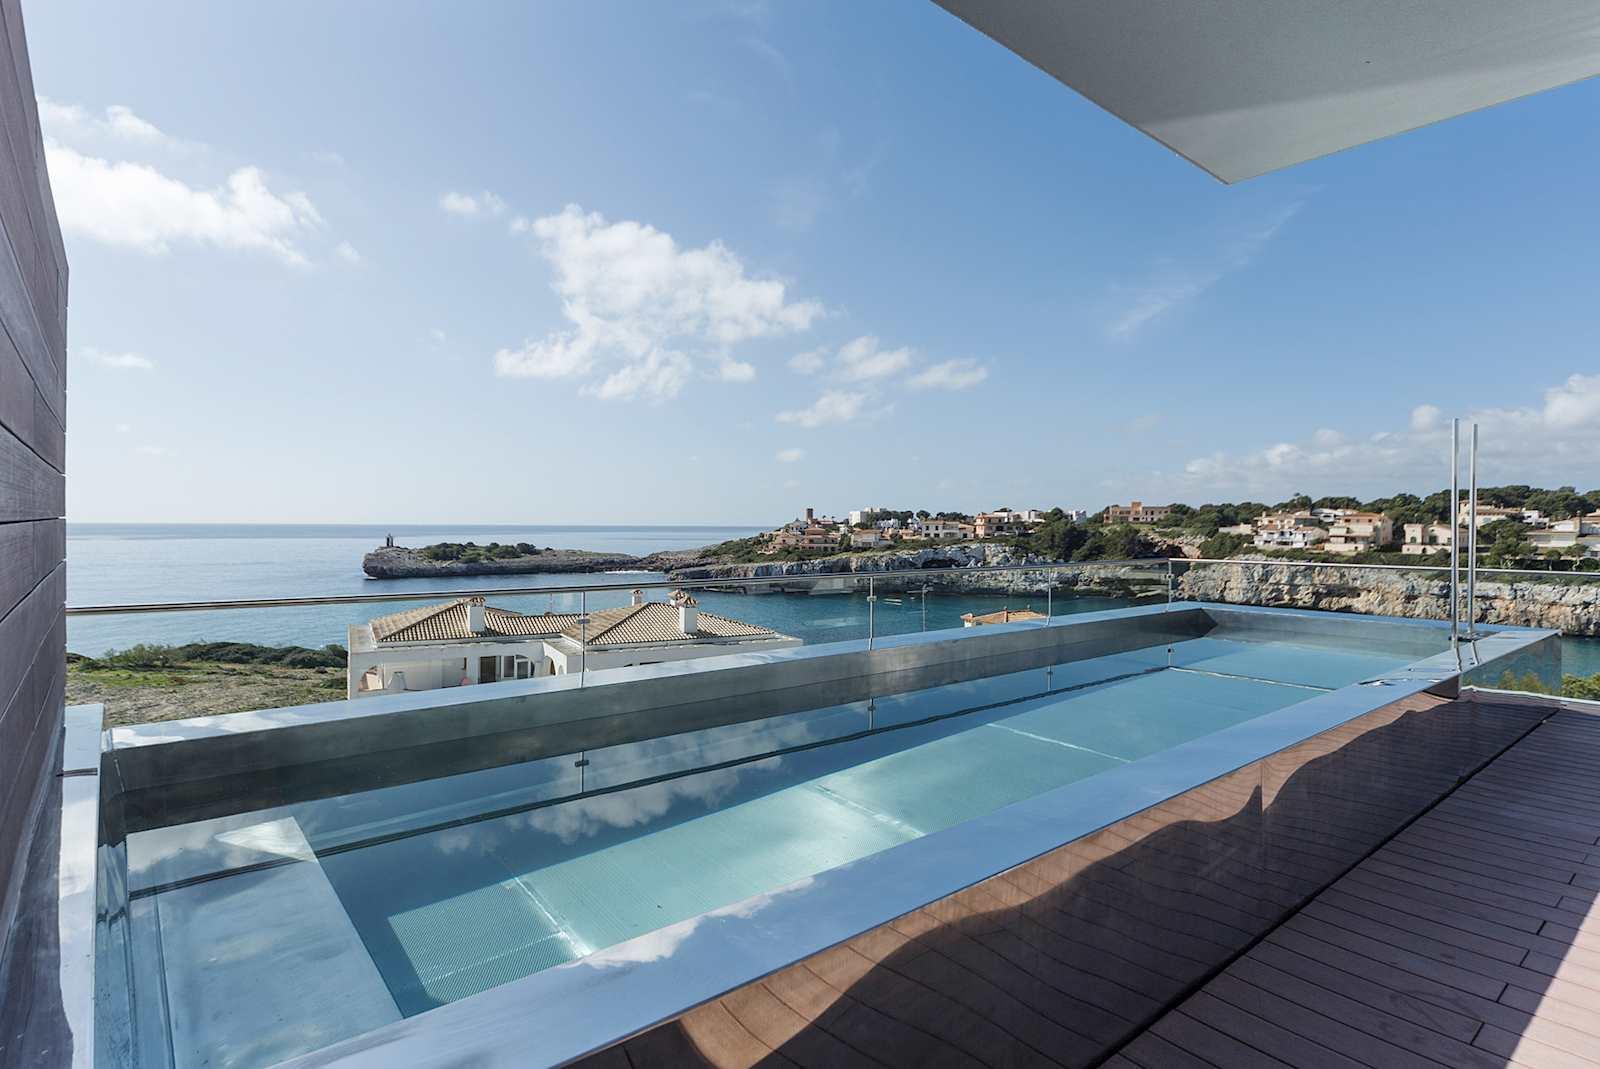 2 bedroom Flat for sale in Portocristo / Port de Manacor with pool - € 1,990,000 (Ref: 3893316)